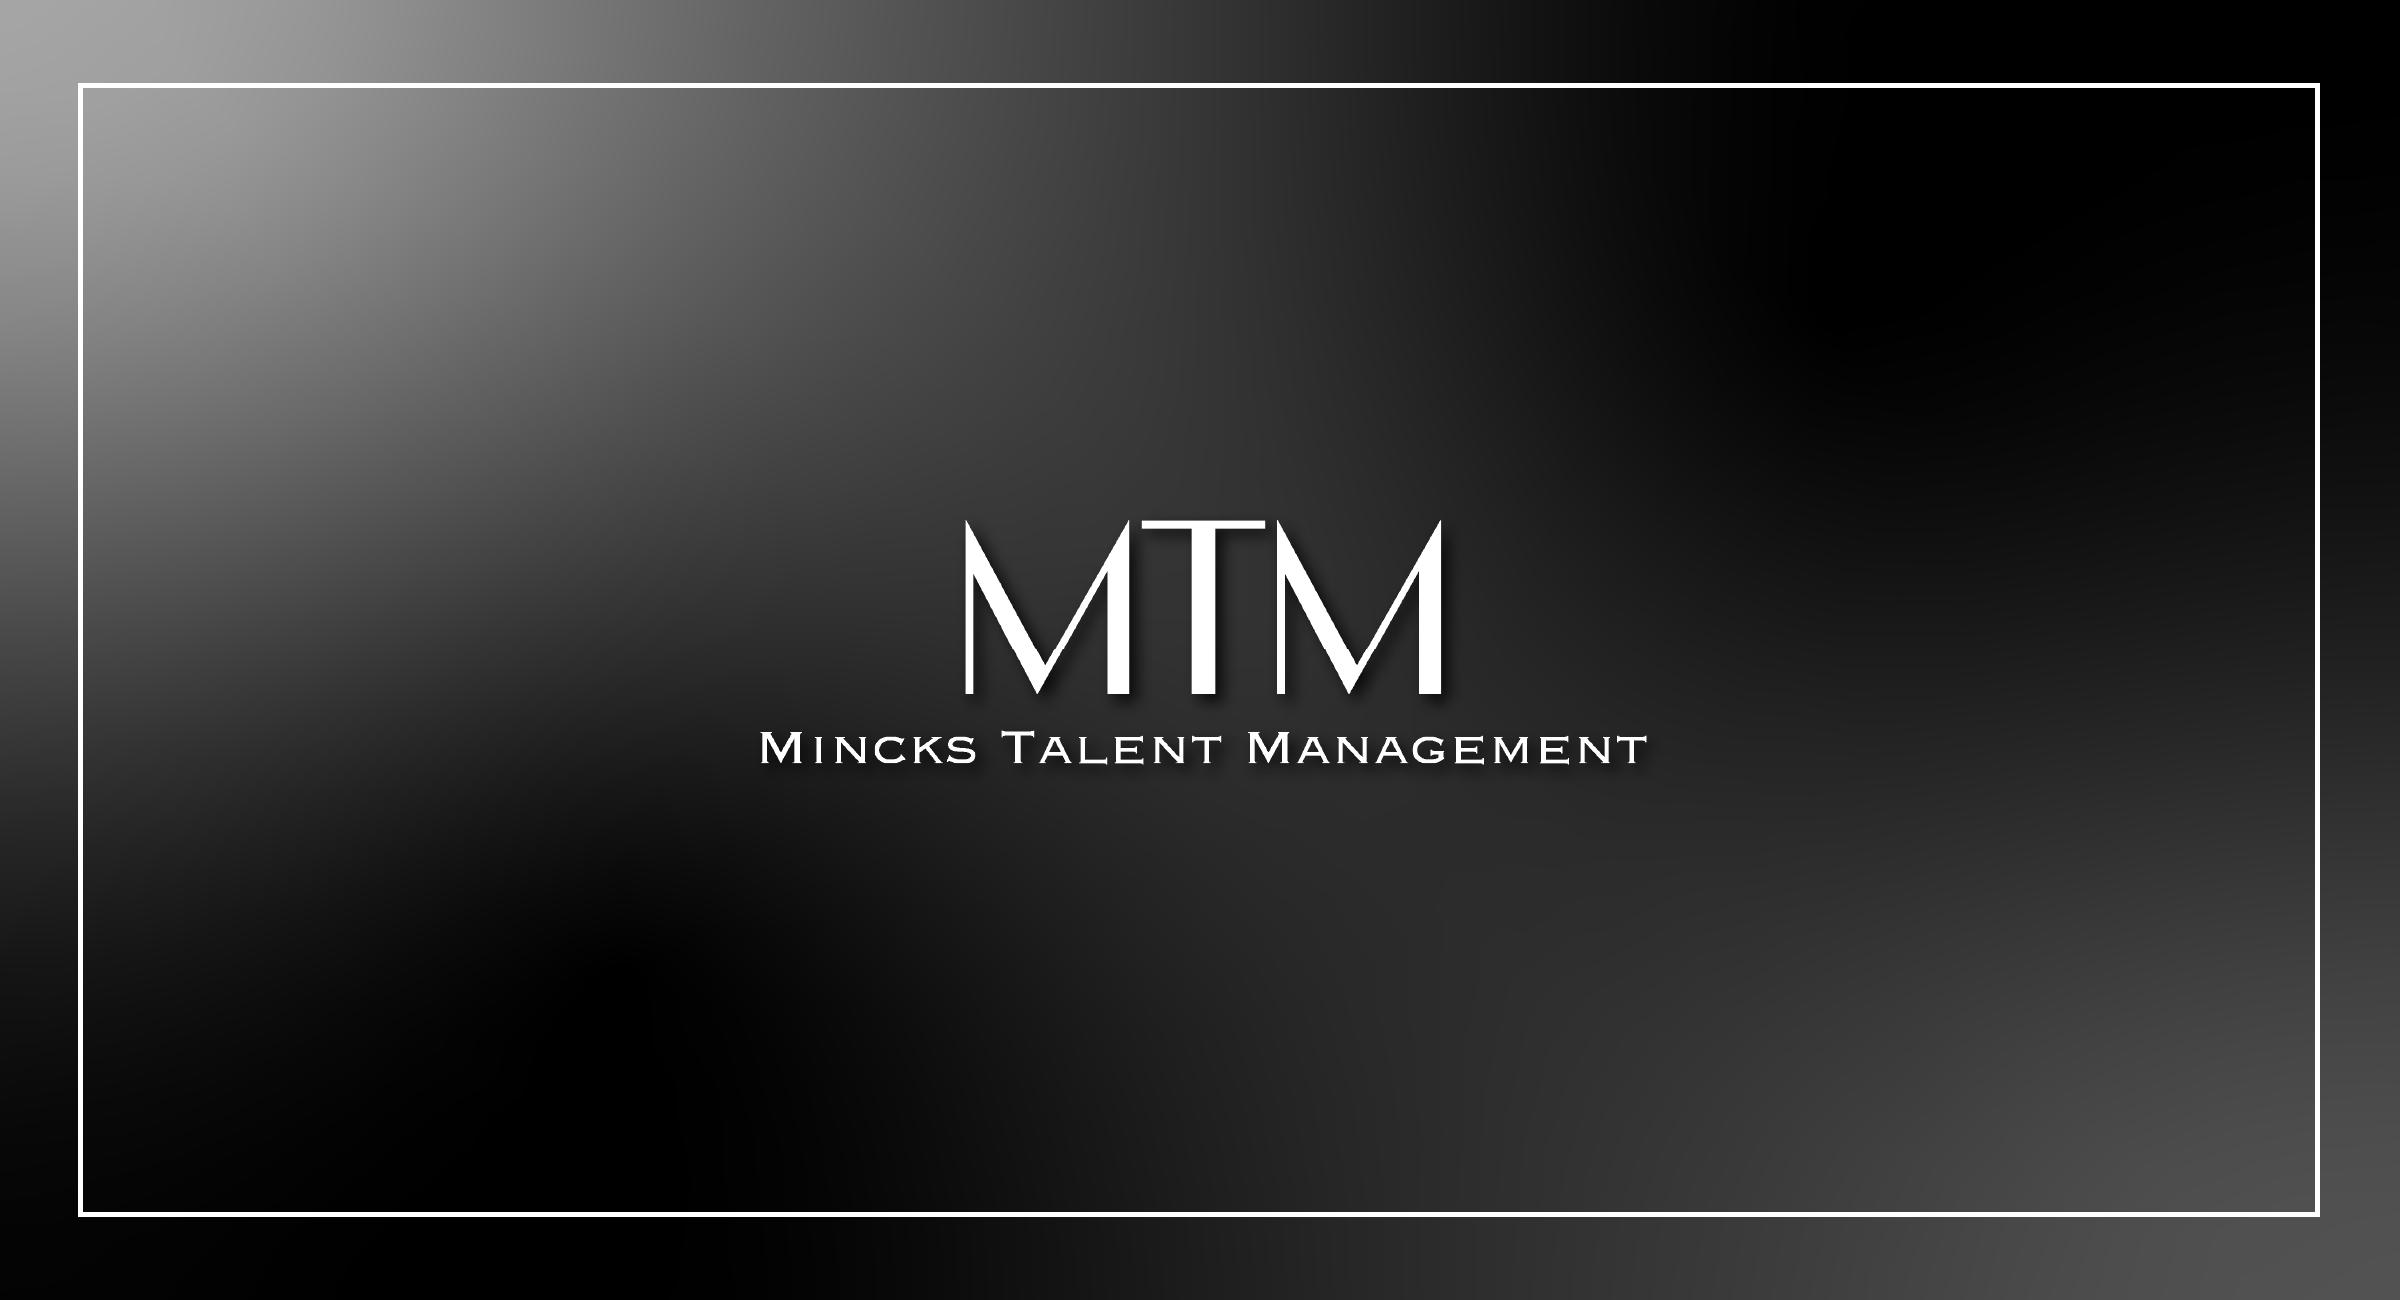 Mincks Talent Management